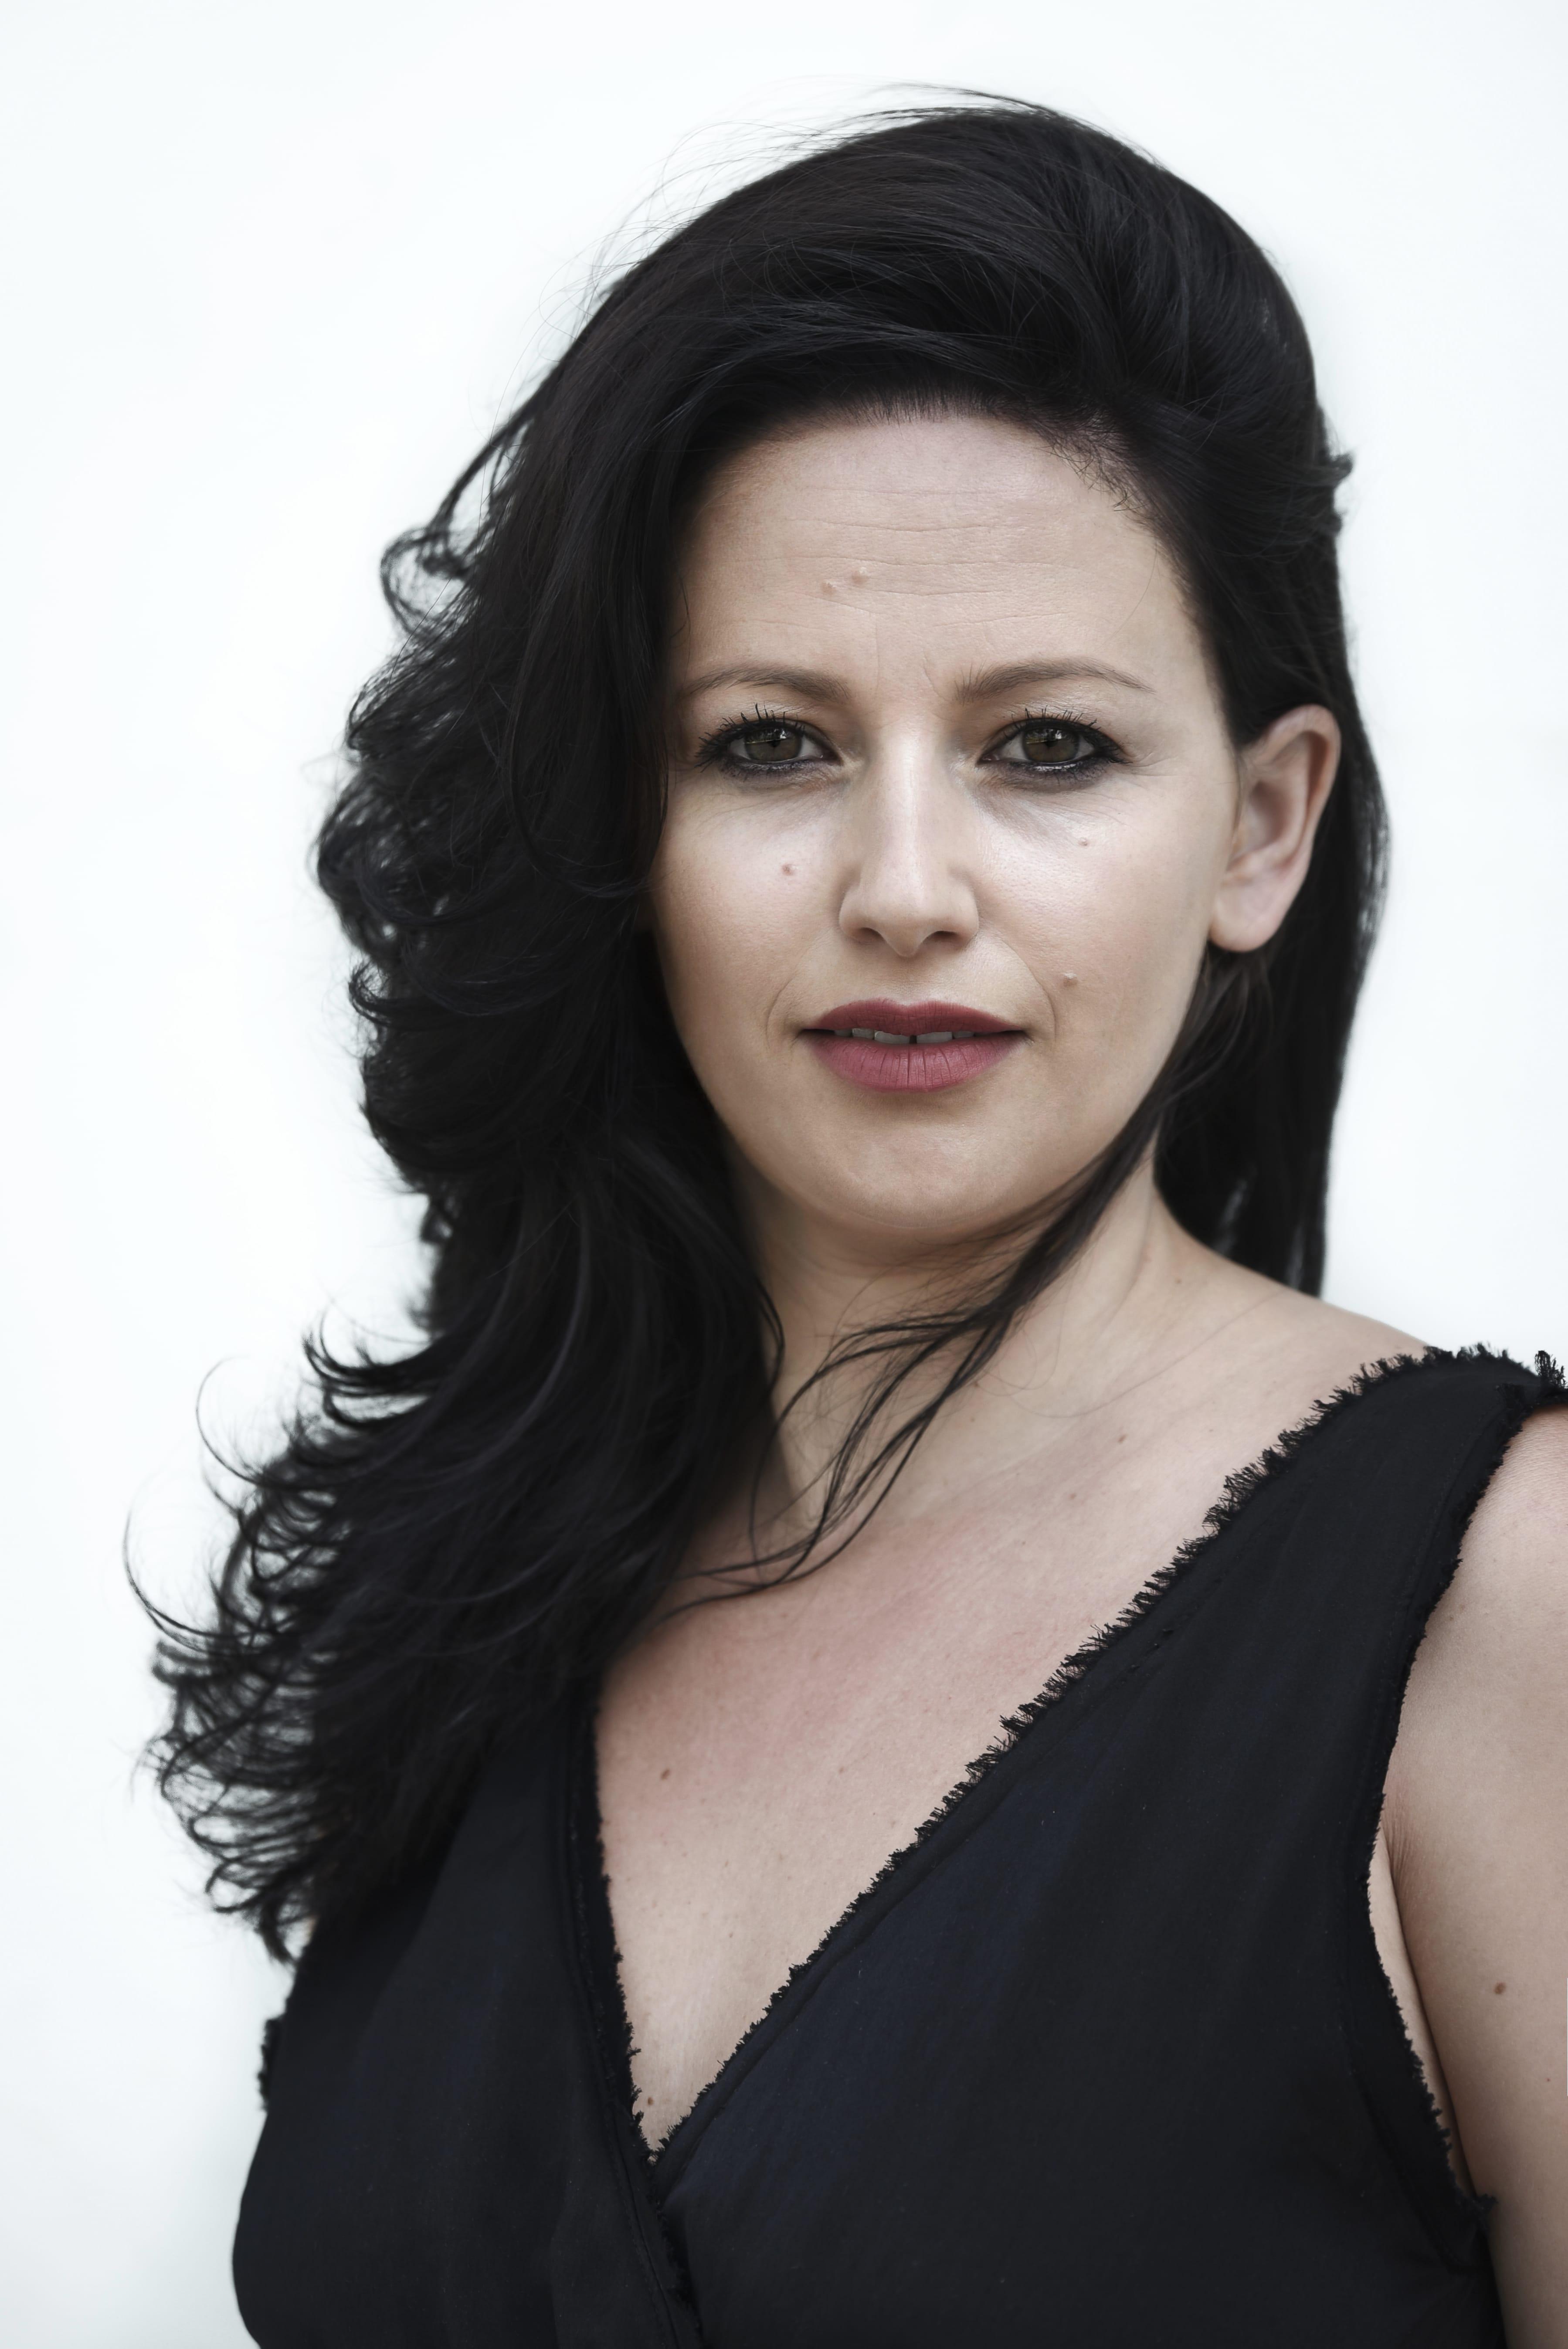 ELSENA SHEHAJ ARTM5